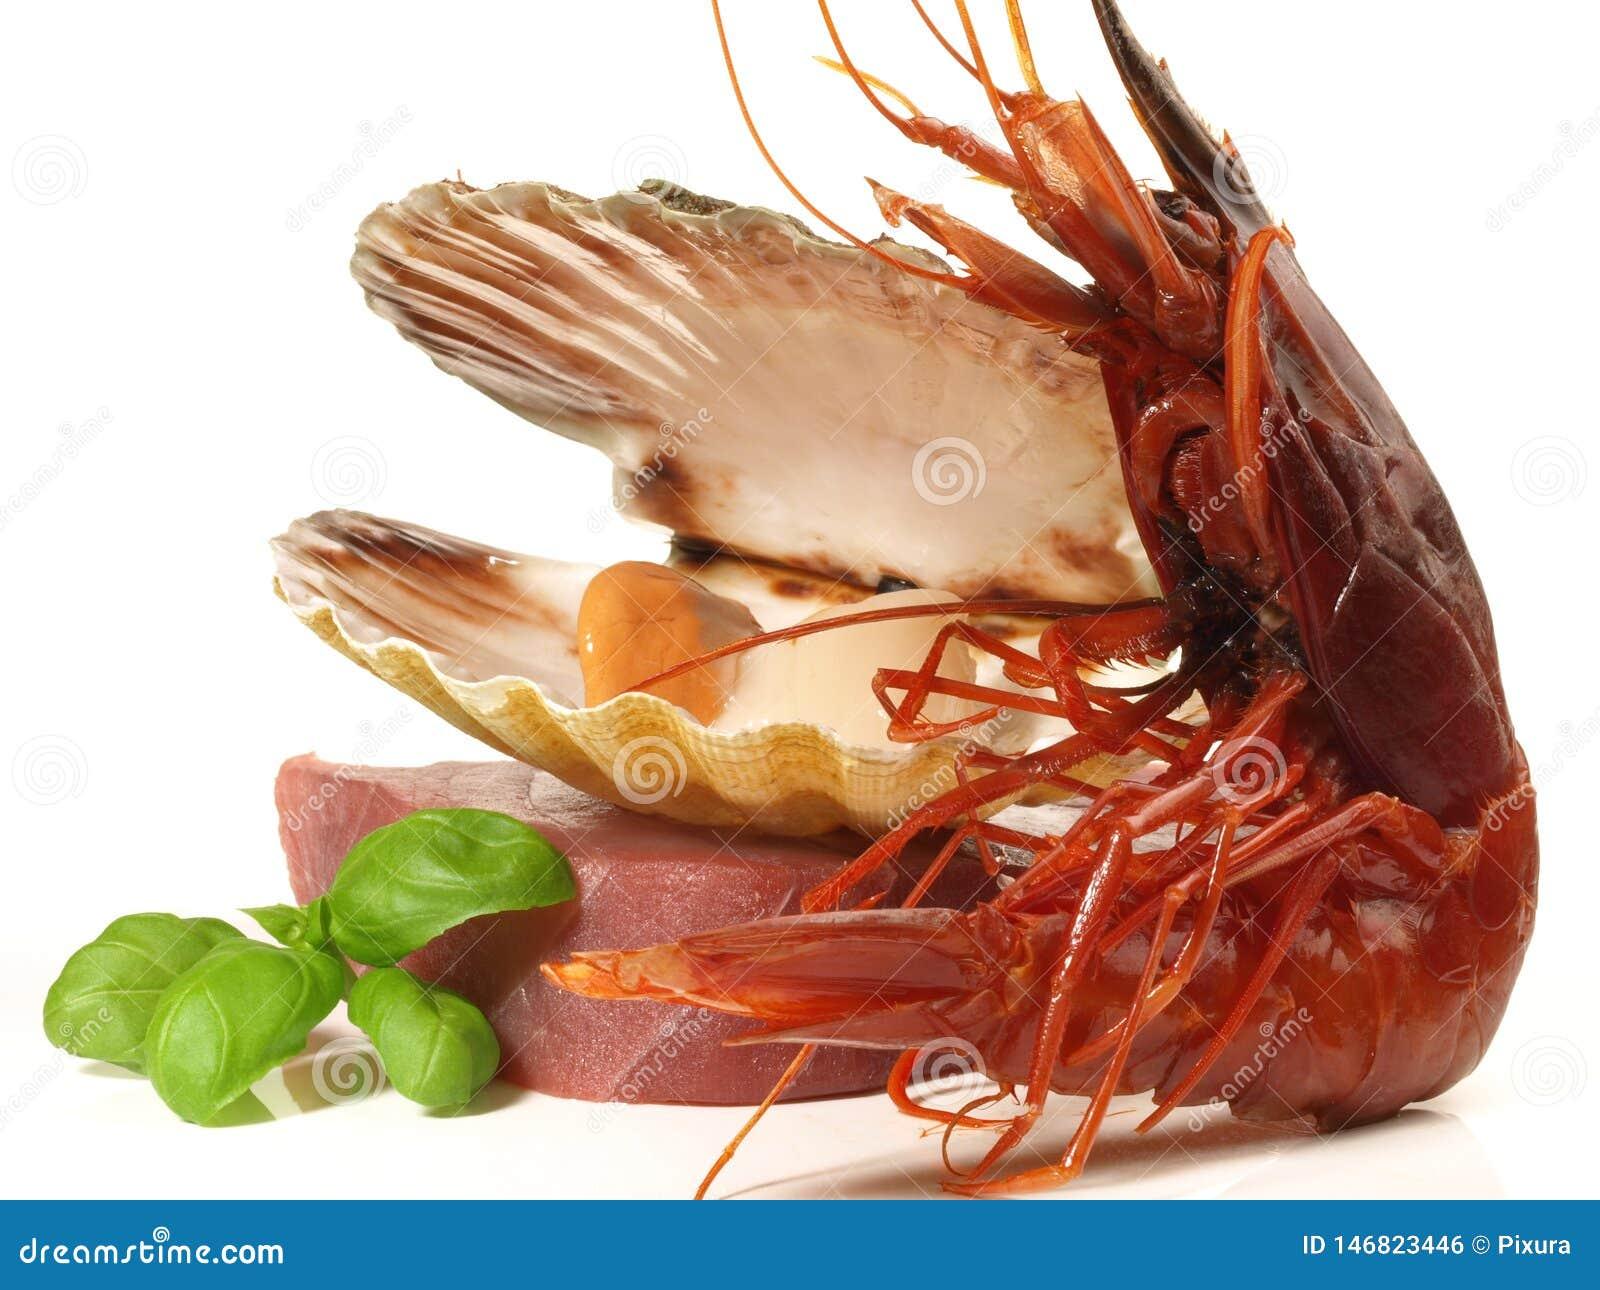 Seafood with Prawn - Shrimp Carabinero